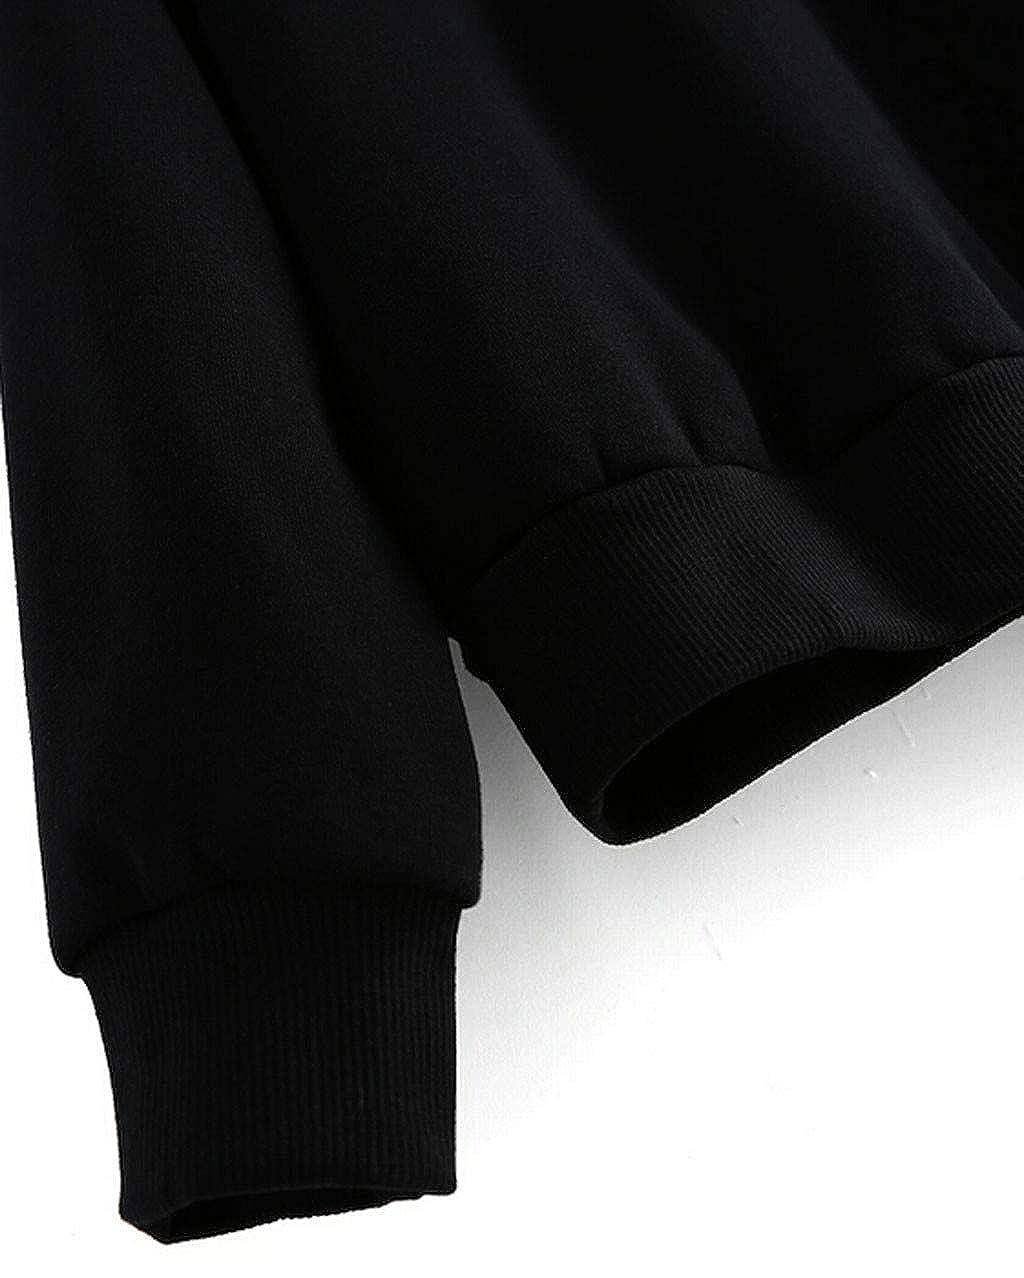 Ulanda Damen Frauen Teenager M/ädchen Kapuzenpullover First I Need Coffee Langarm Pulli Pullover Sweatshirt mit Kapuze Sport Hoodies Top Jumper Langarmshirt Herbst Winter Top Bluse Shirt